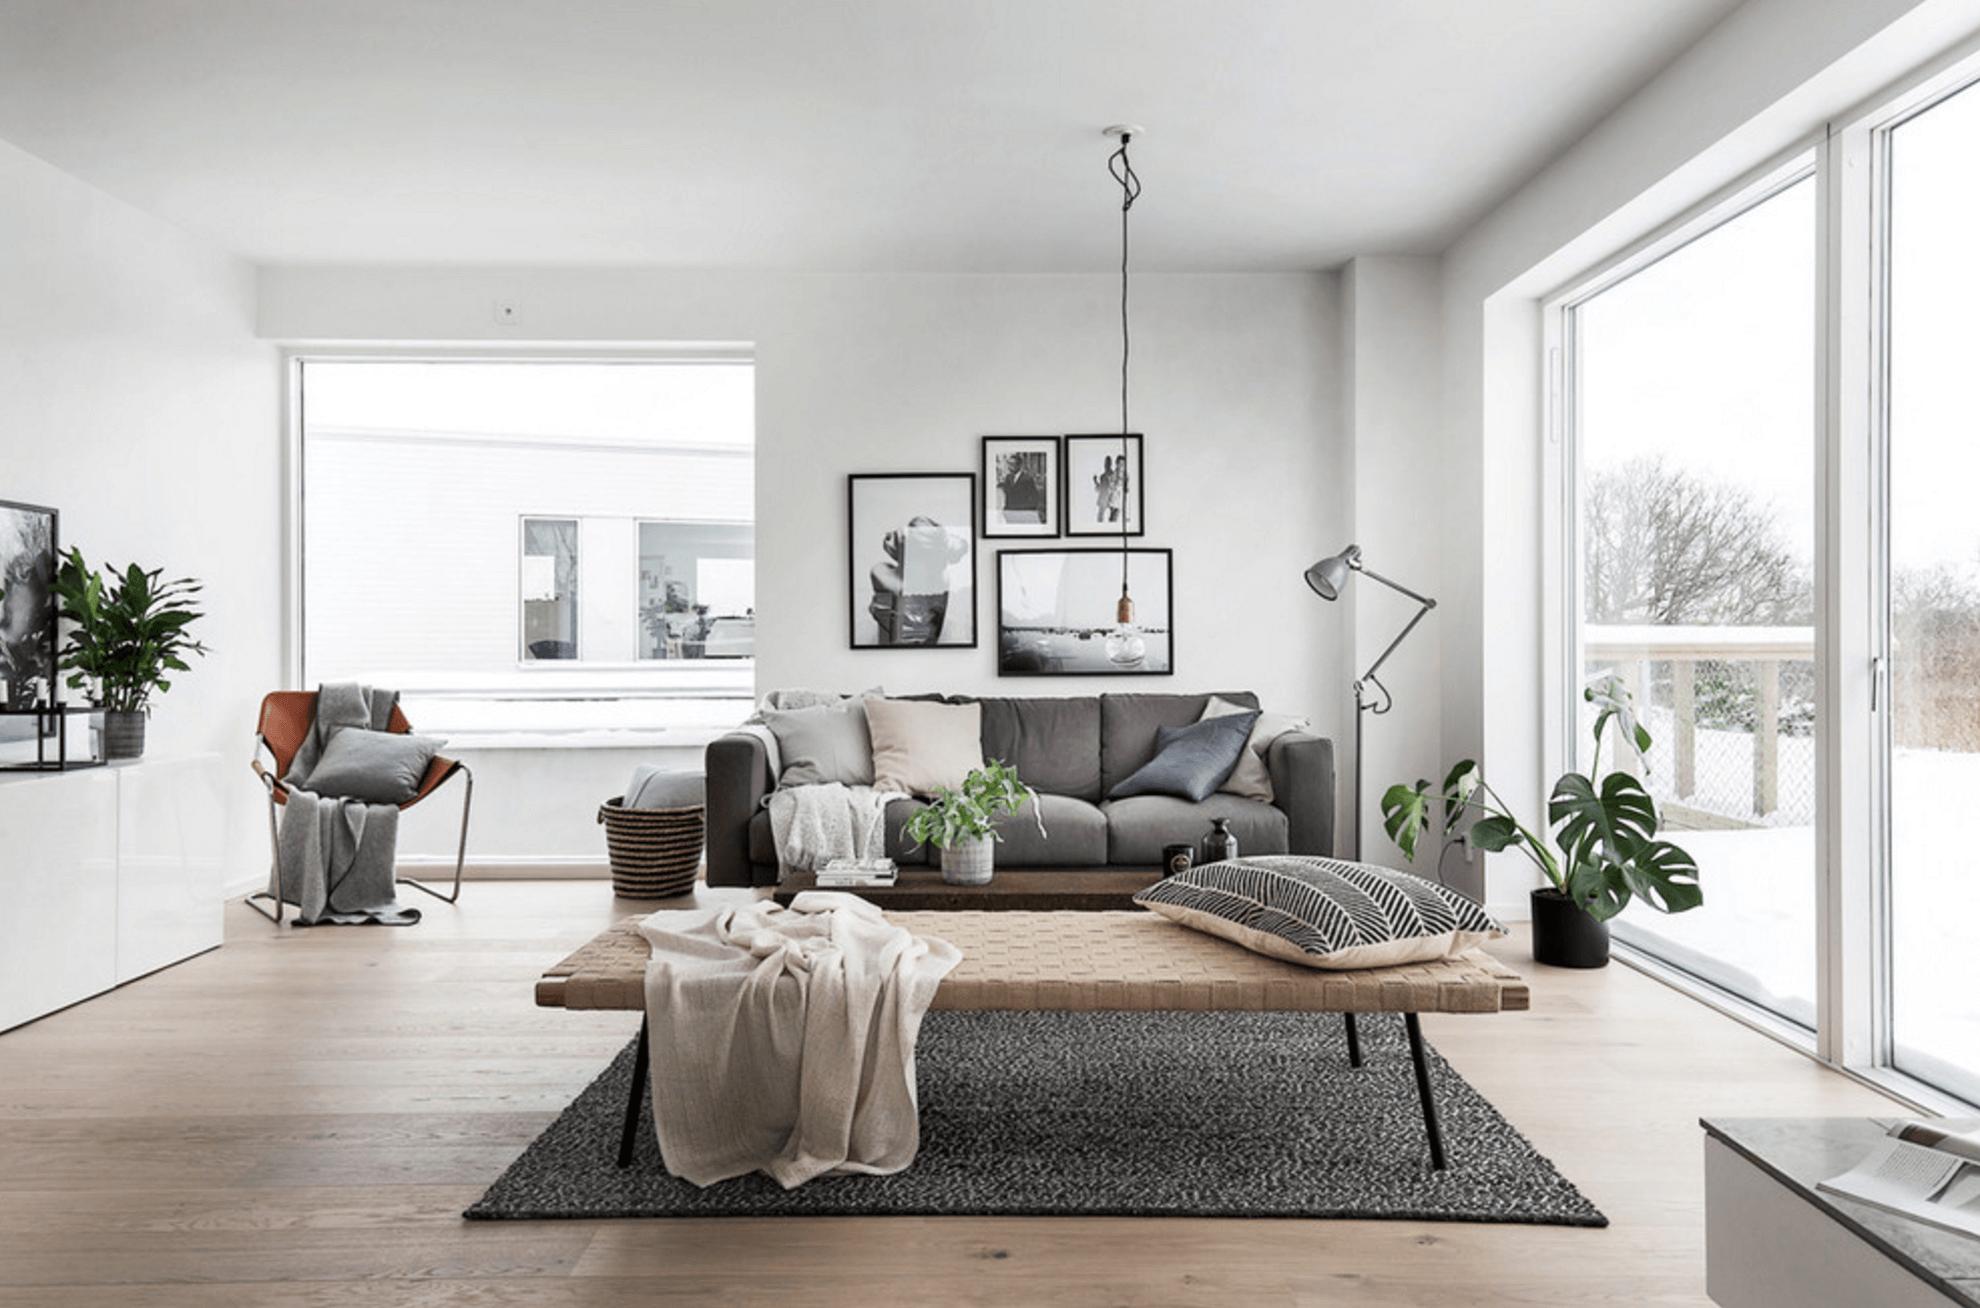 Cresleigh Homes on | Scandinavian interior design, Interiors and ...